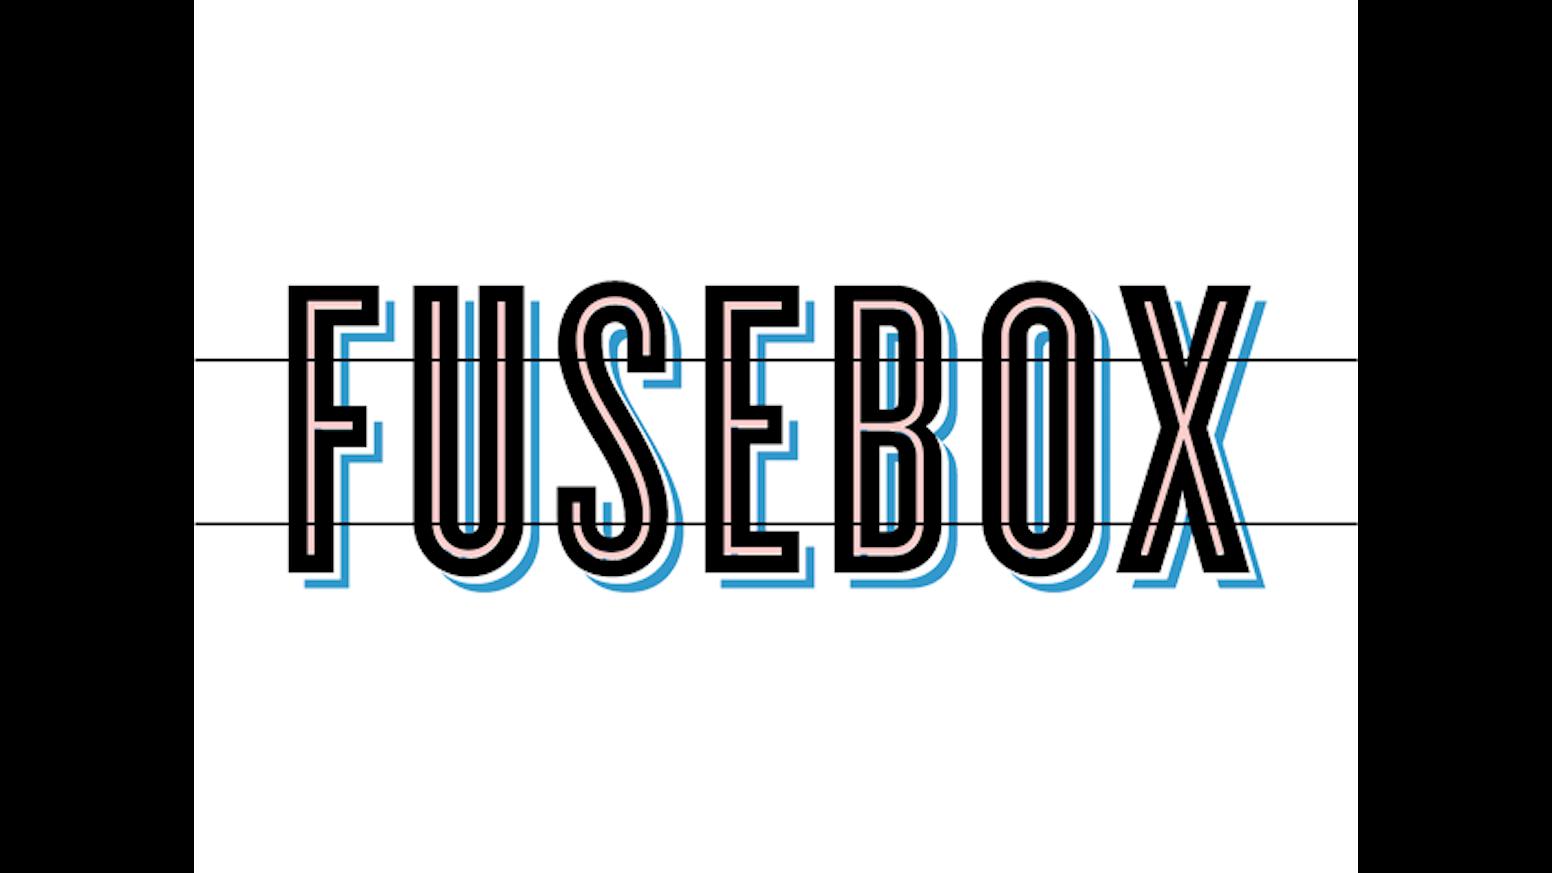 fusebox festival th anniversary range art by fusebox fusebox festival 10th anniversary range art